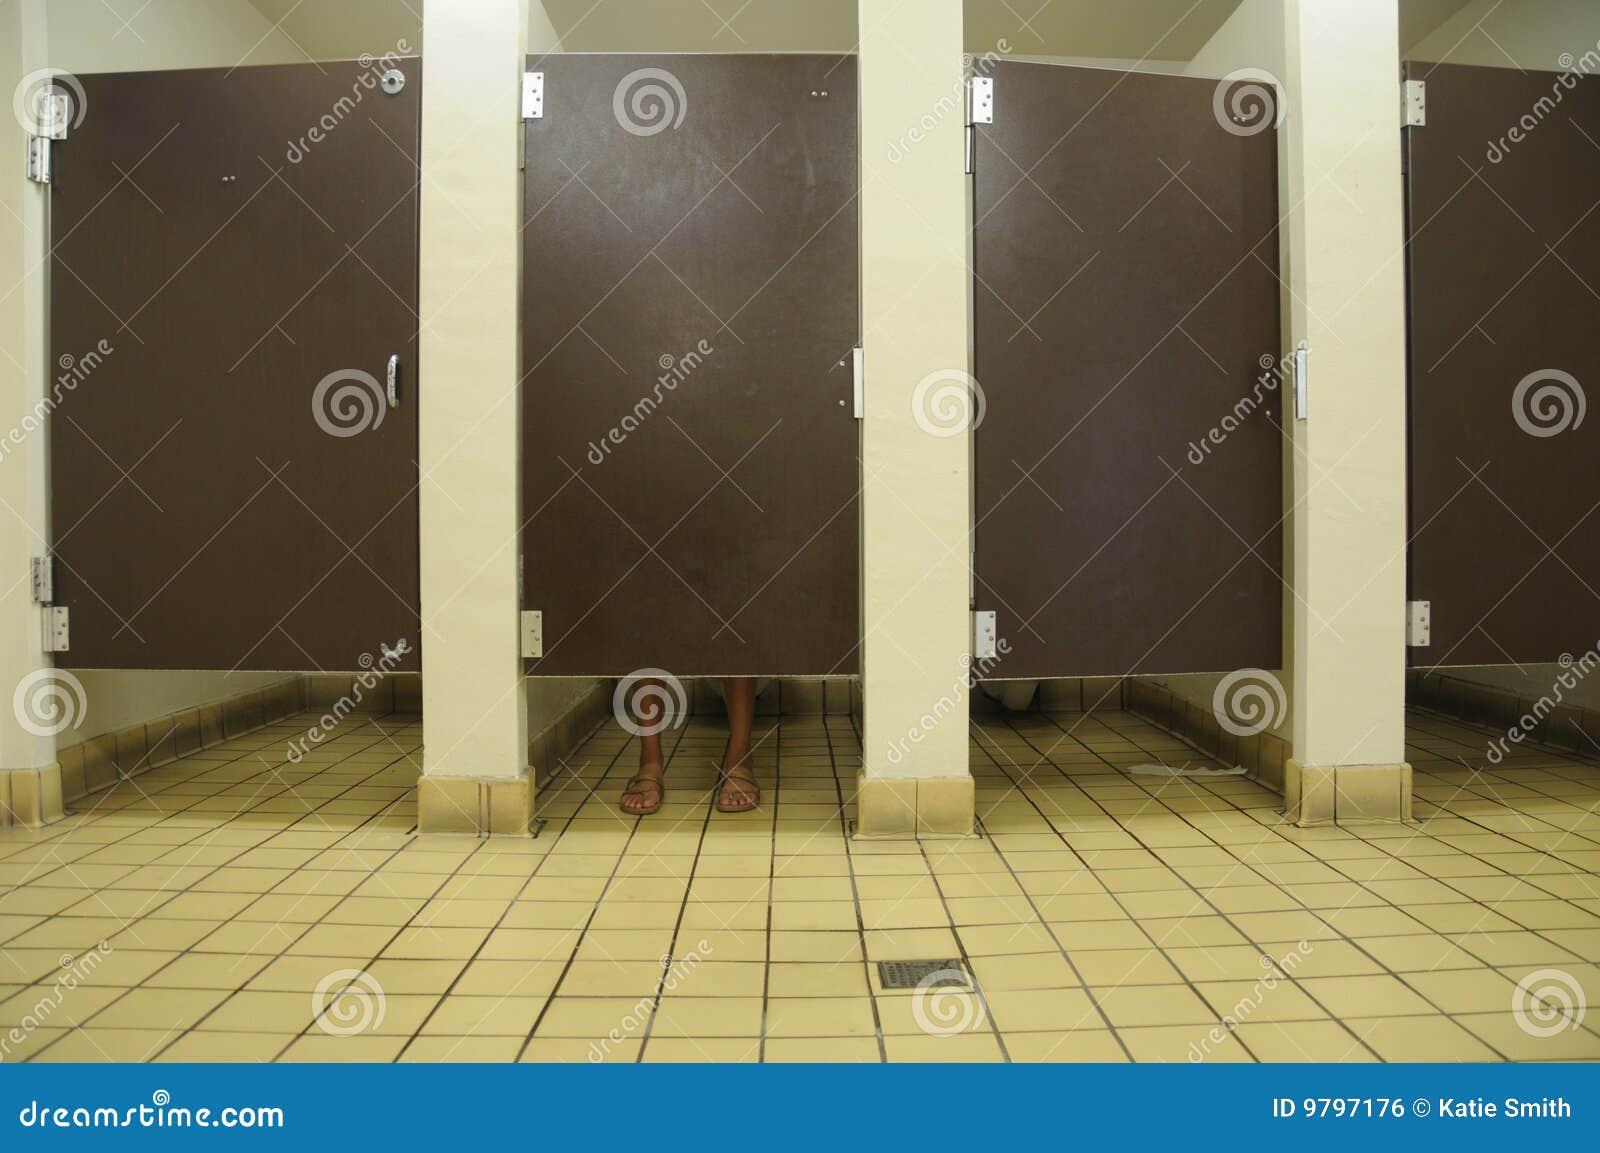 Bathroom Feet Royalty Free Stock Image - Image: 9797176